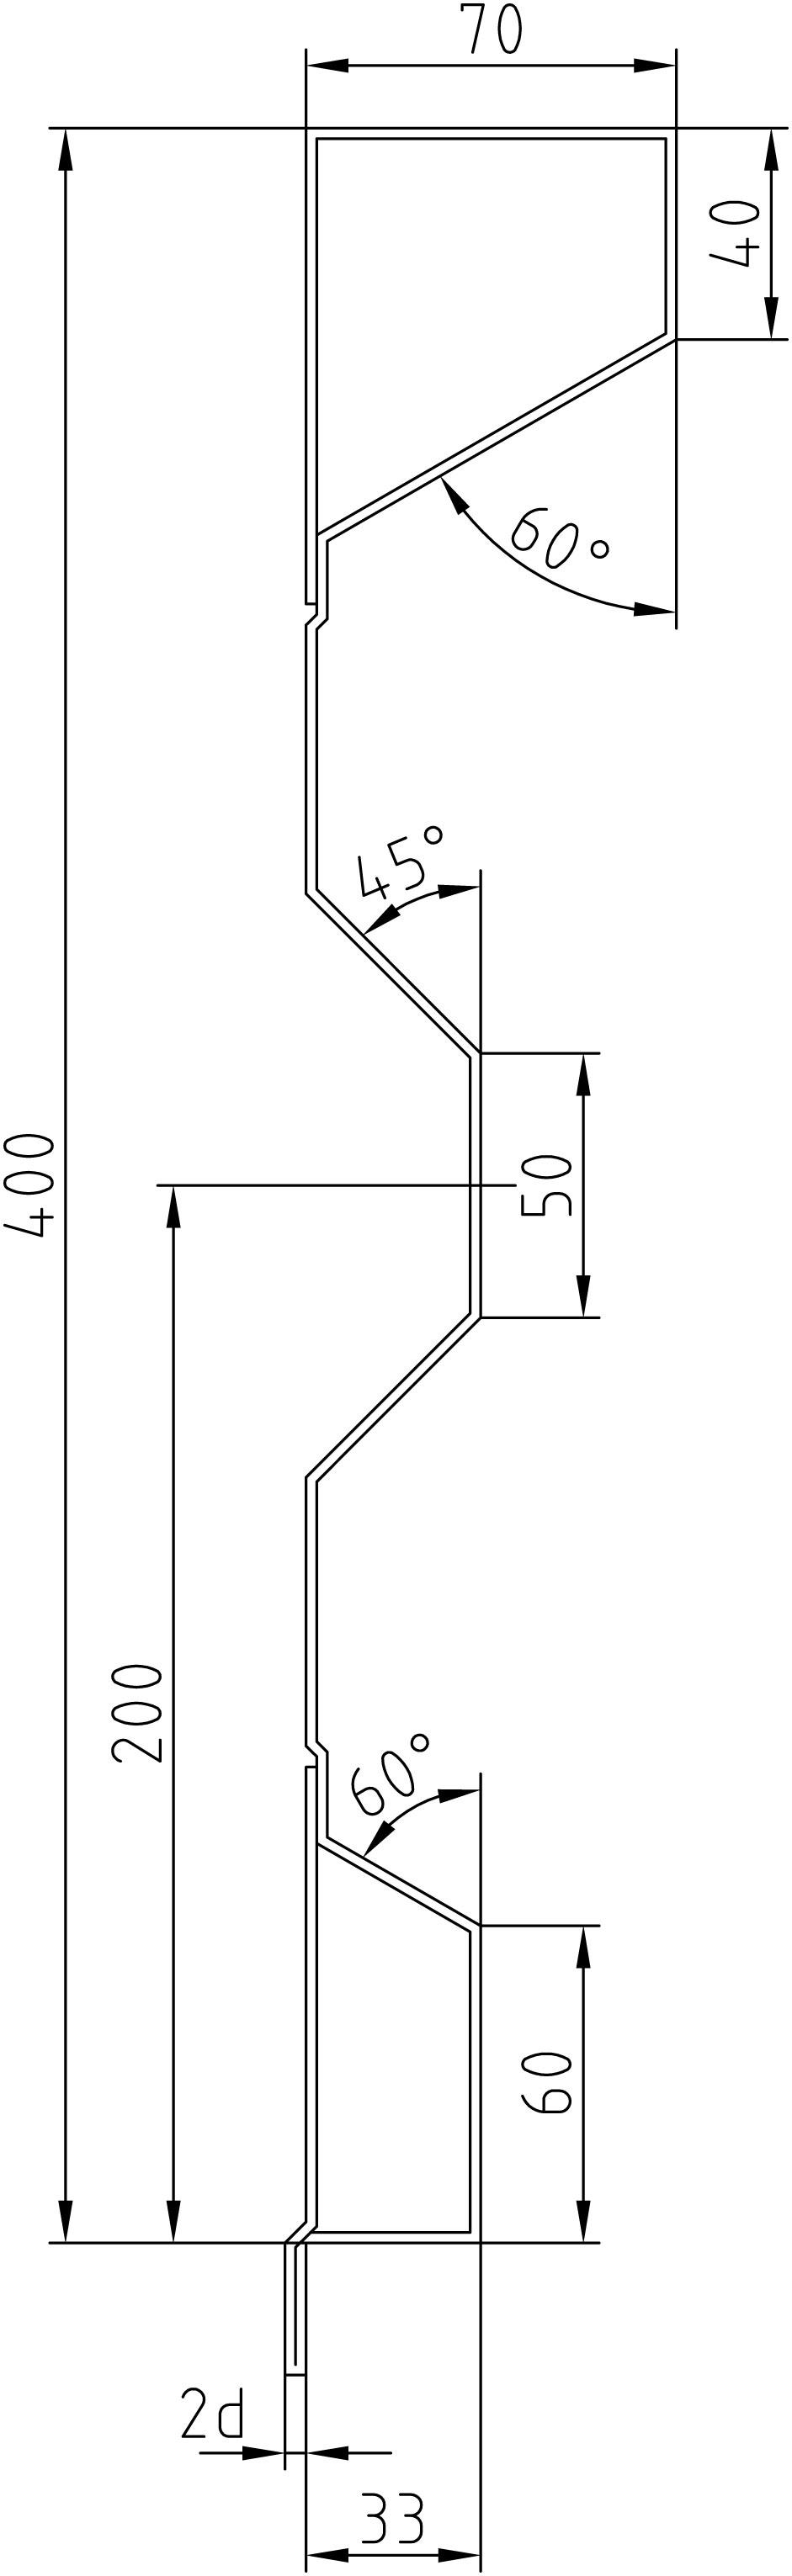 Brantner Kipper und Anhänger - 400x2x7720 AW samt EL o. BW- Verb. o. PW- Bolzen